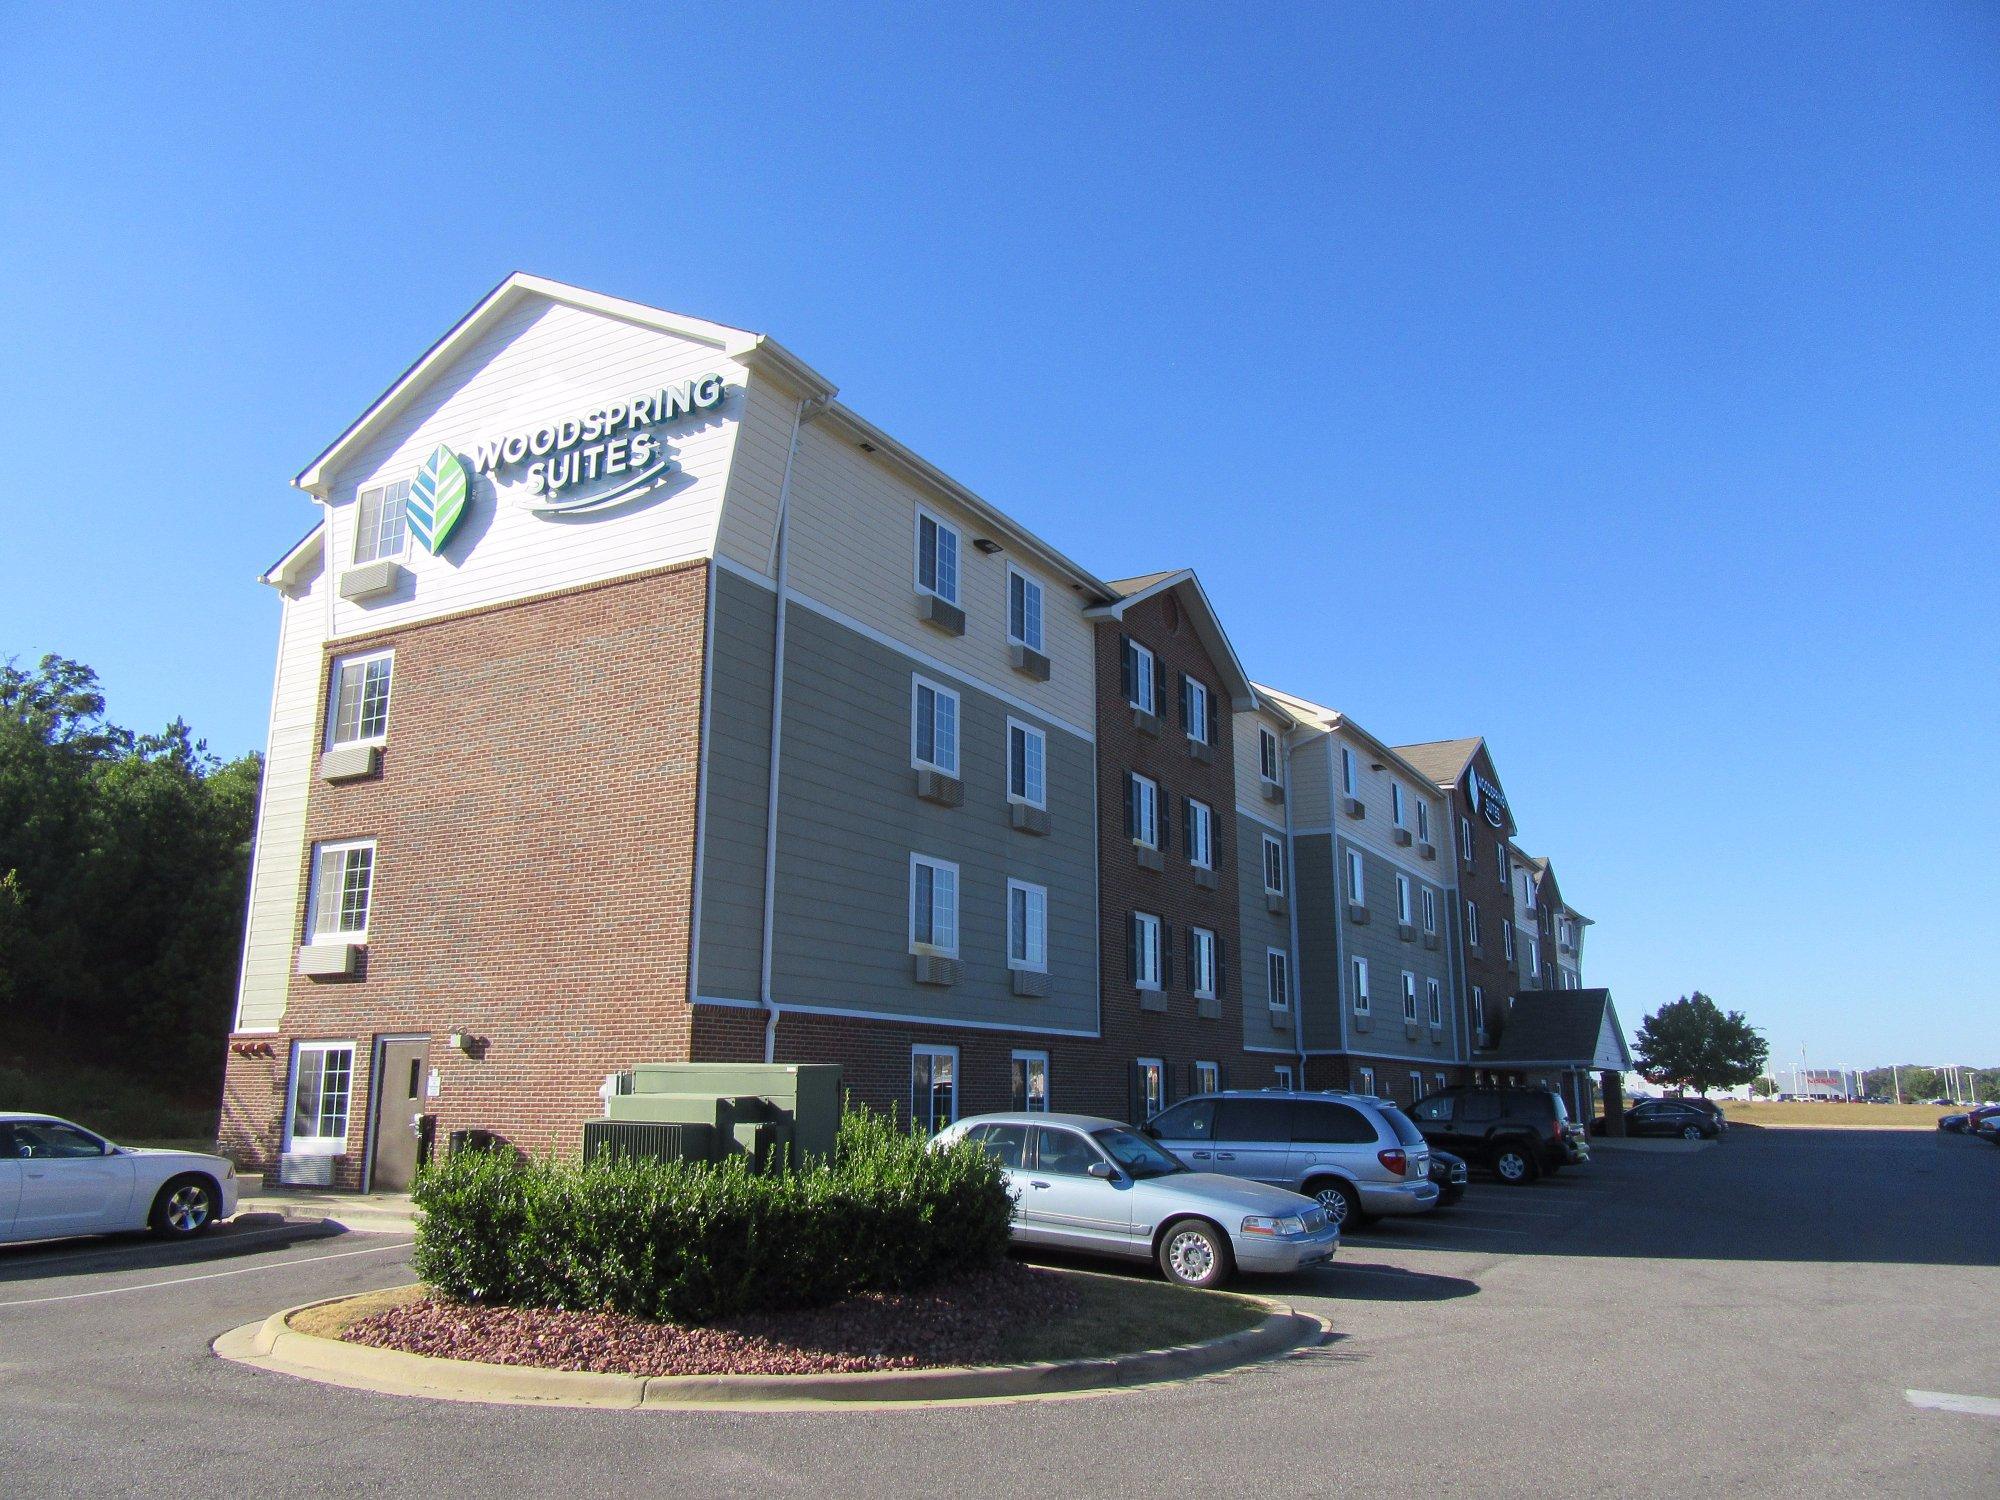 WoodSpring Suites Birmingham Southwest